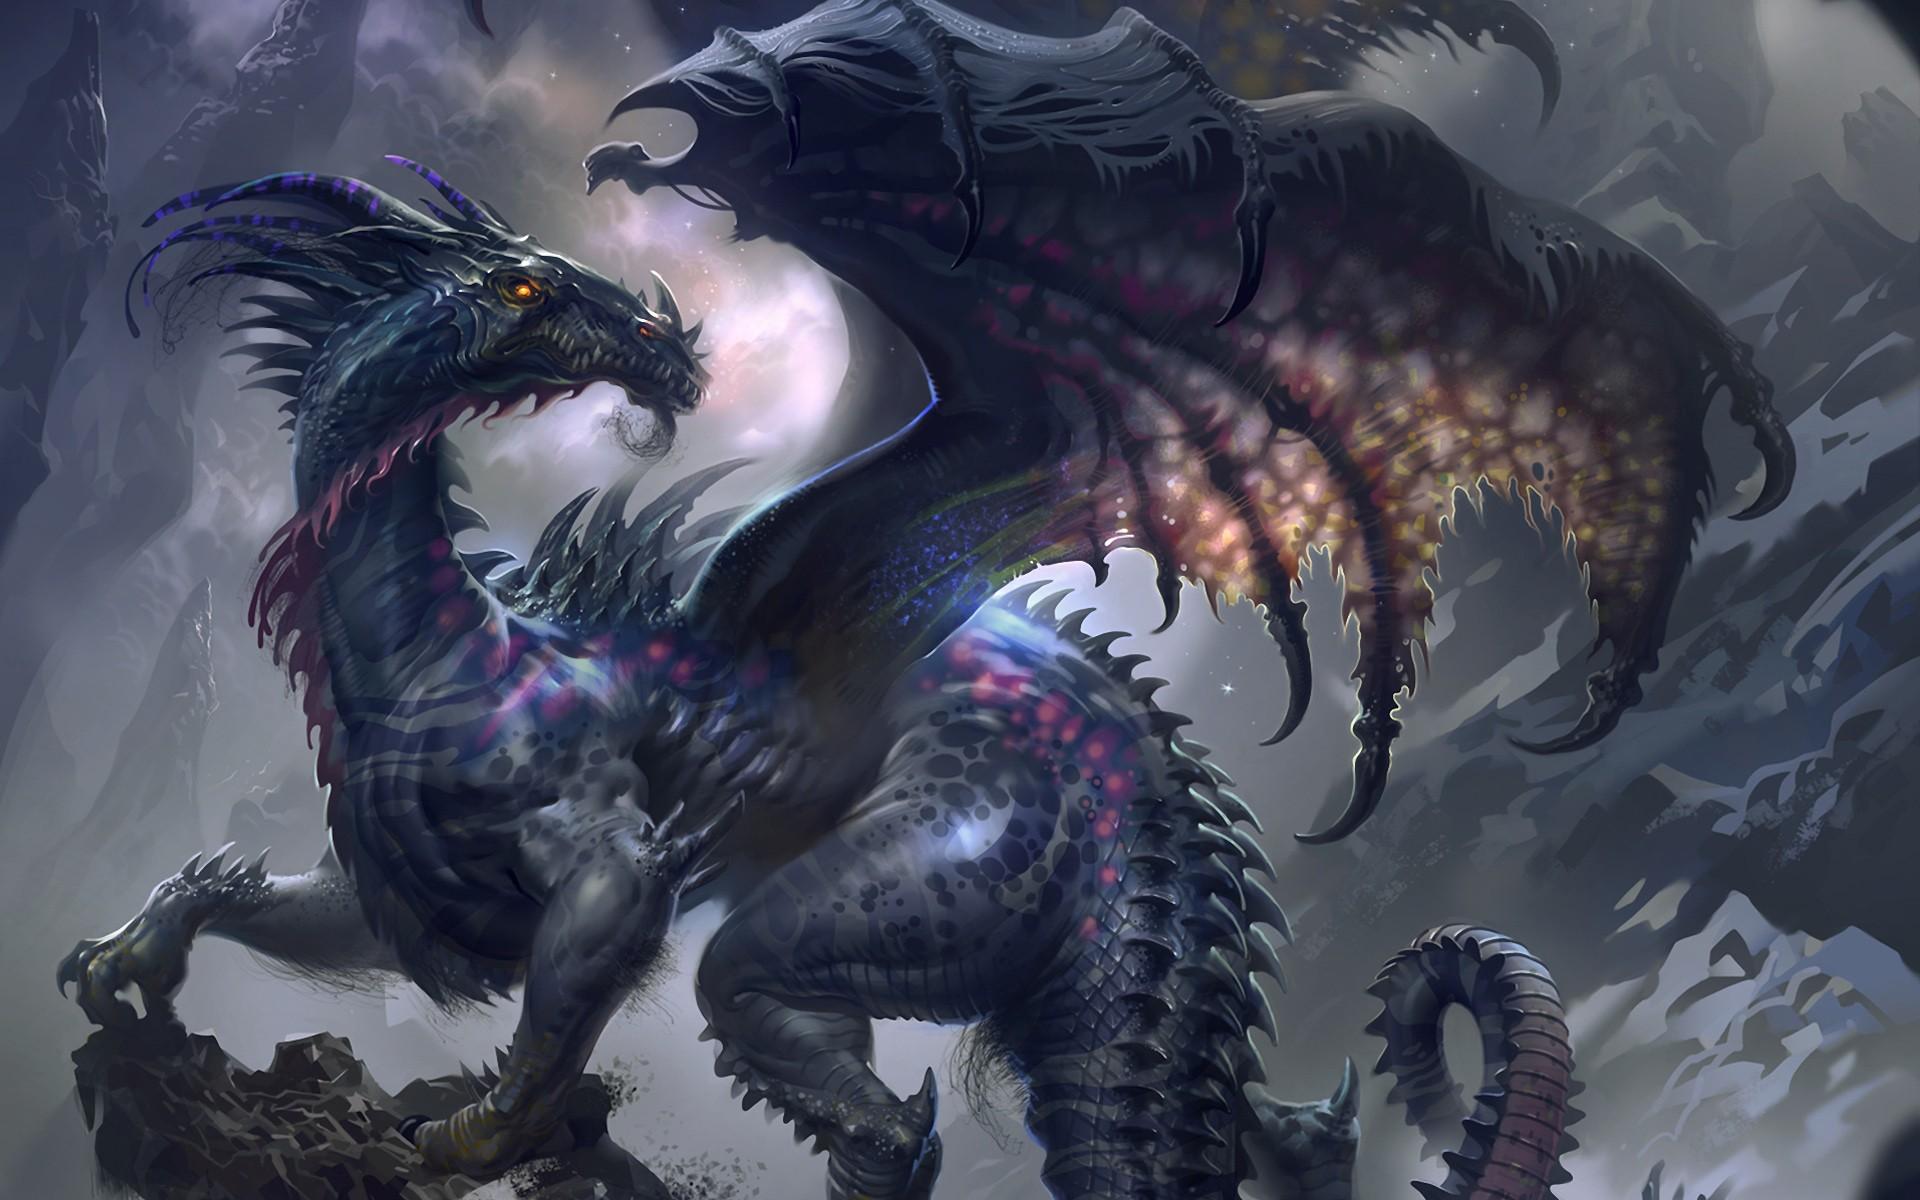 Dragon Knight III Jeu PC   Images vidos astuces et avis 1920x1200